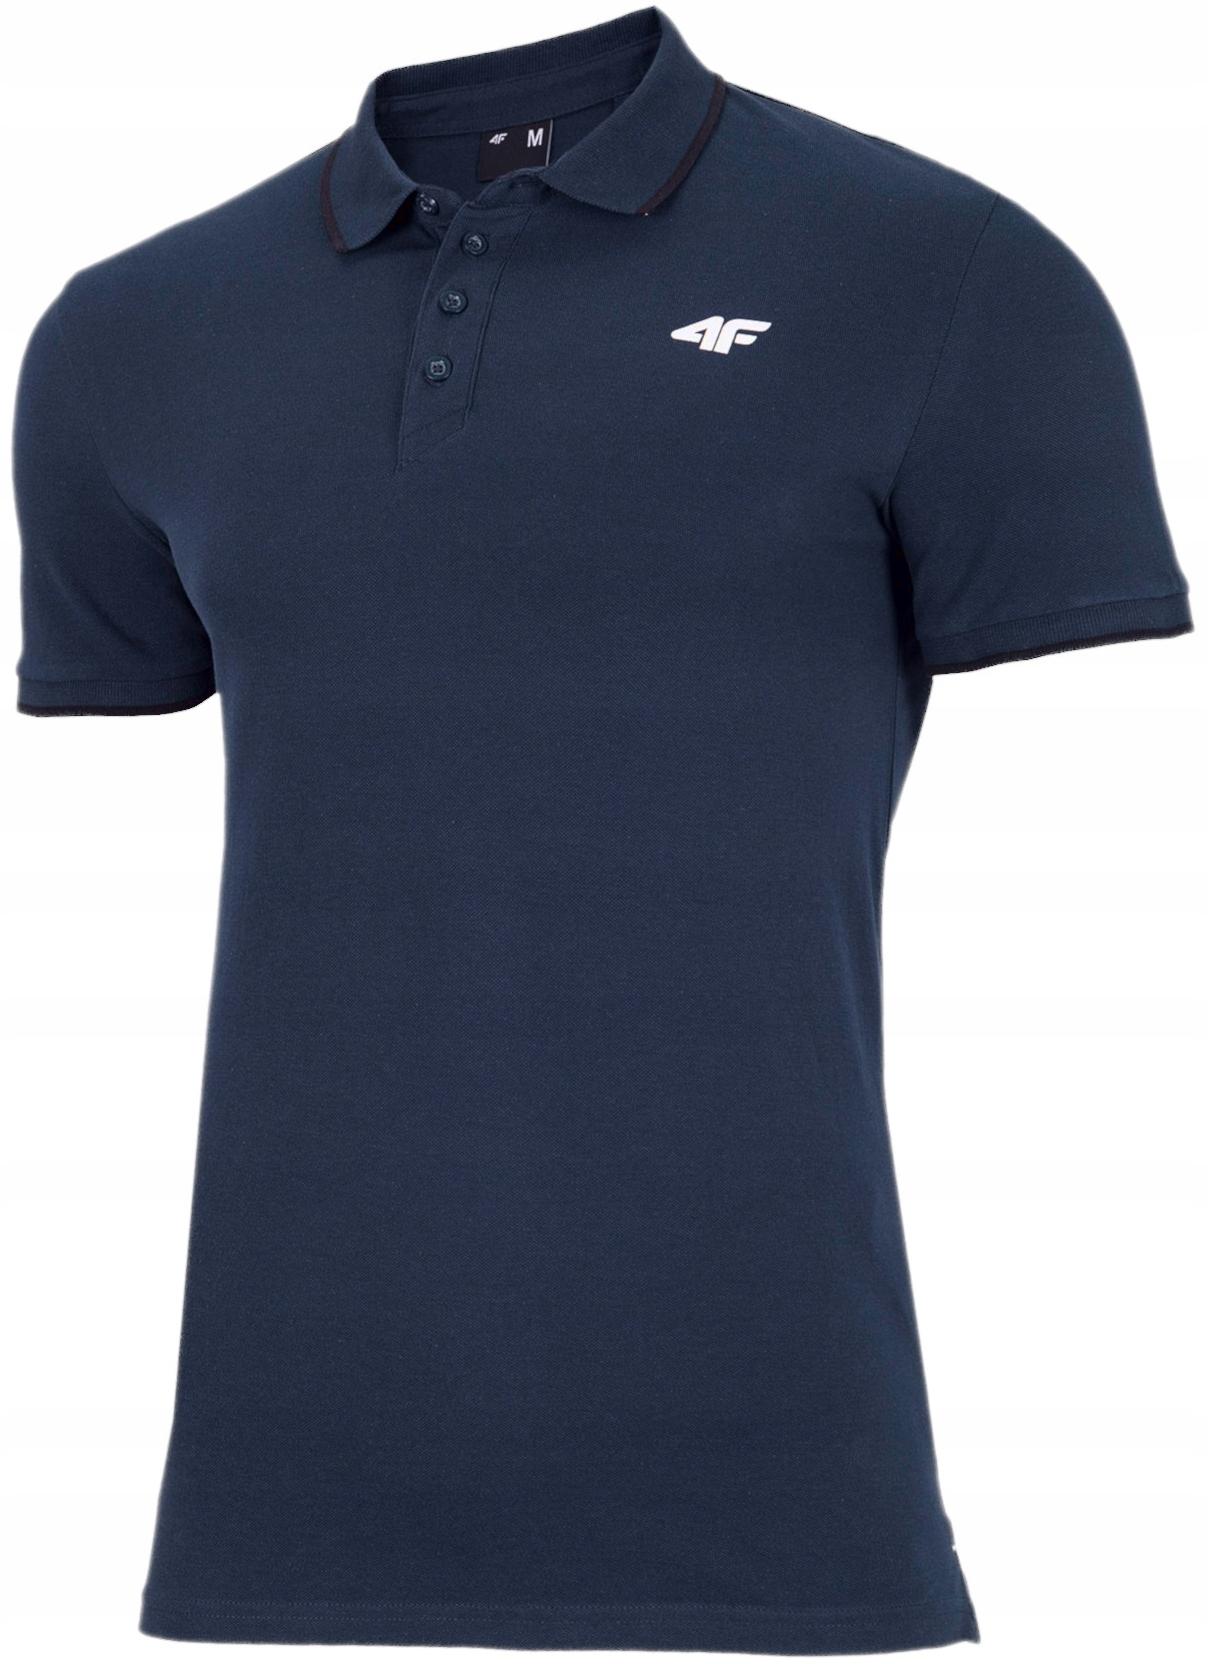 Polówka Męska 4F Polo Koszulka T-SHIRT BAWEŁNA XL